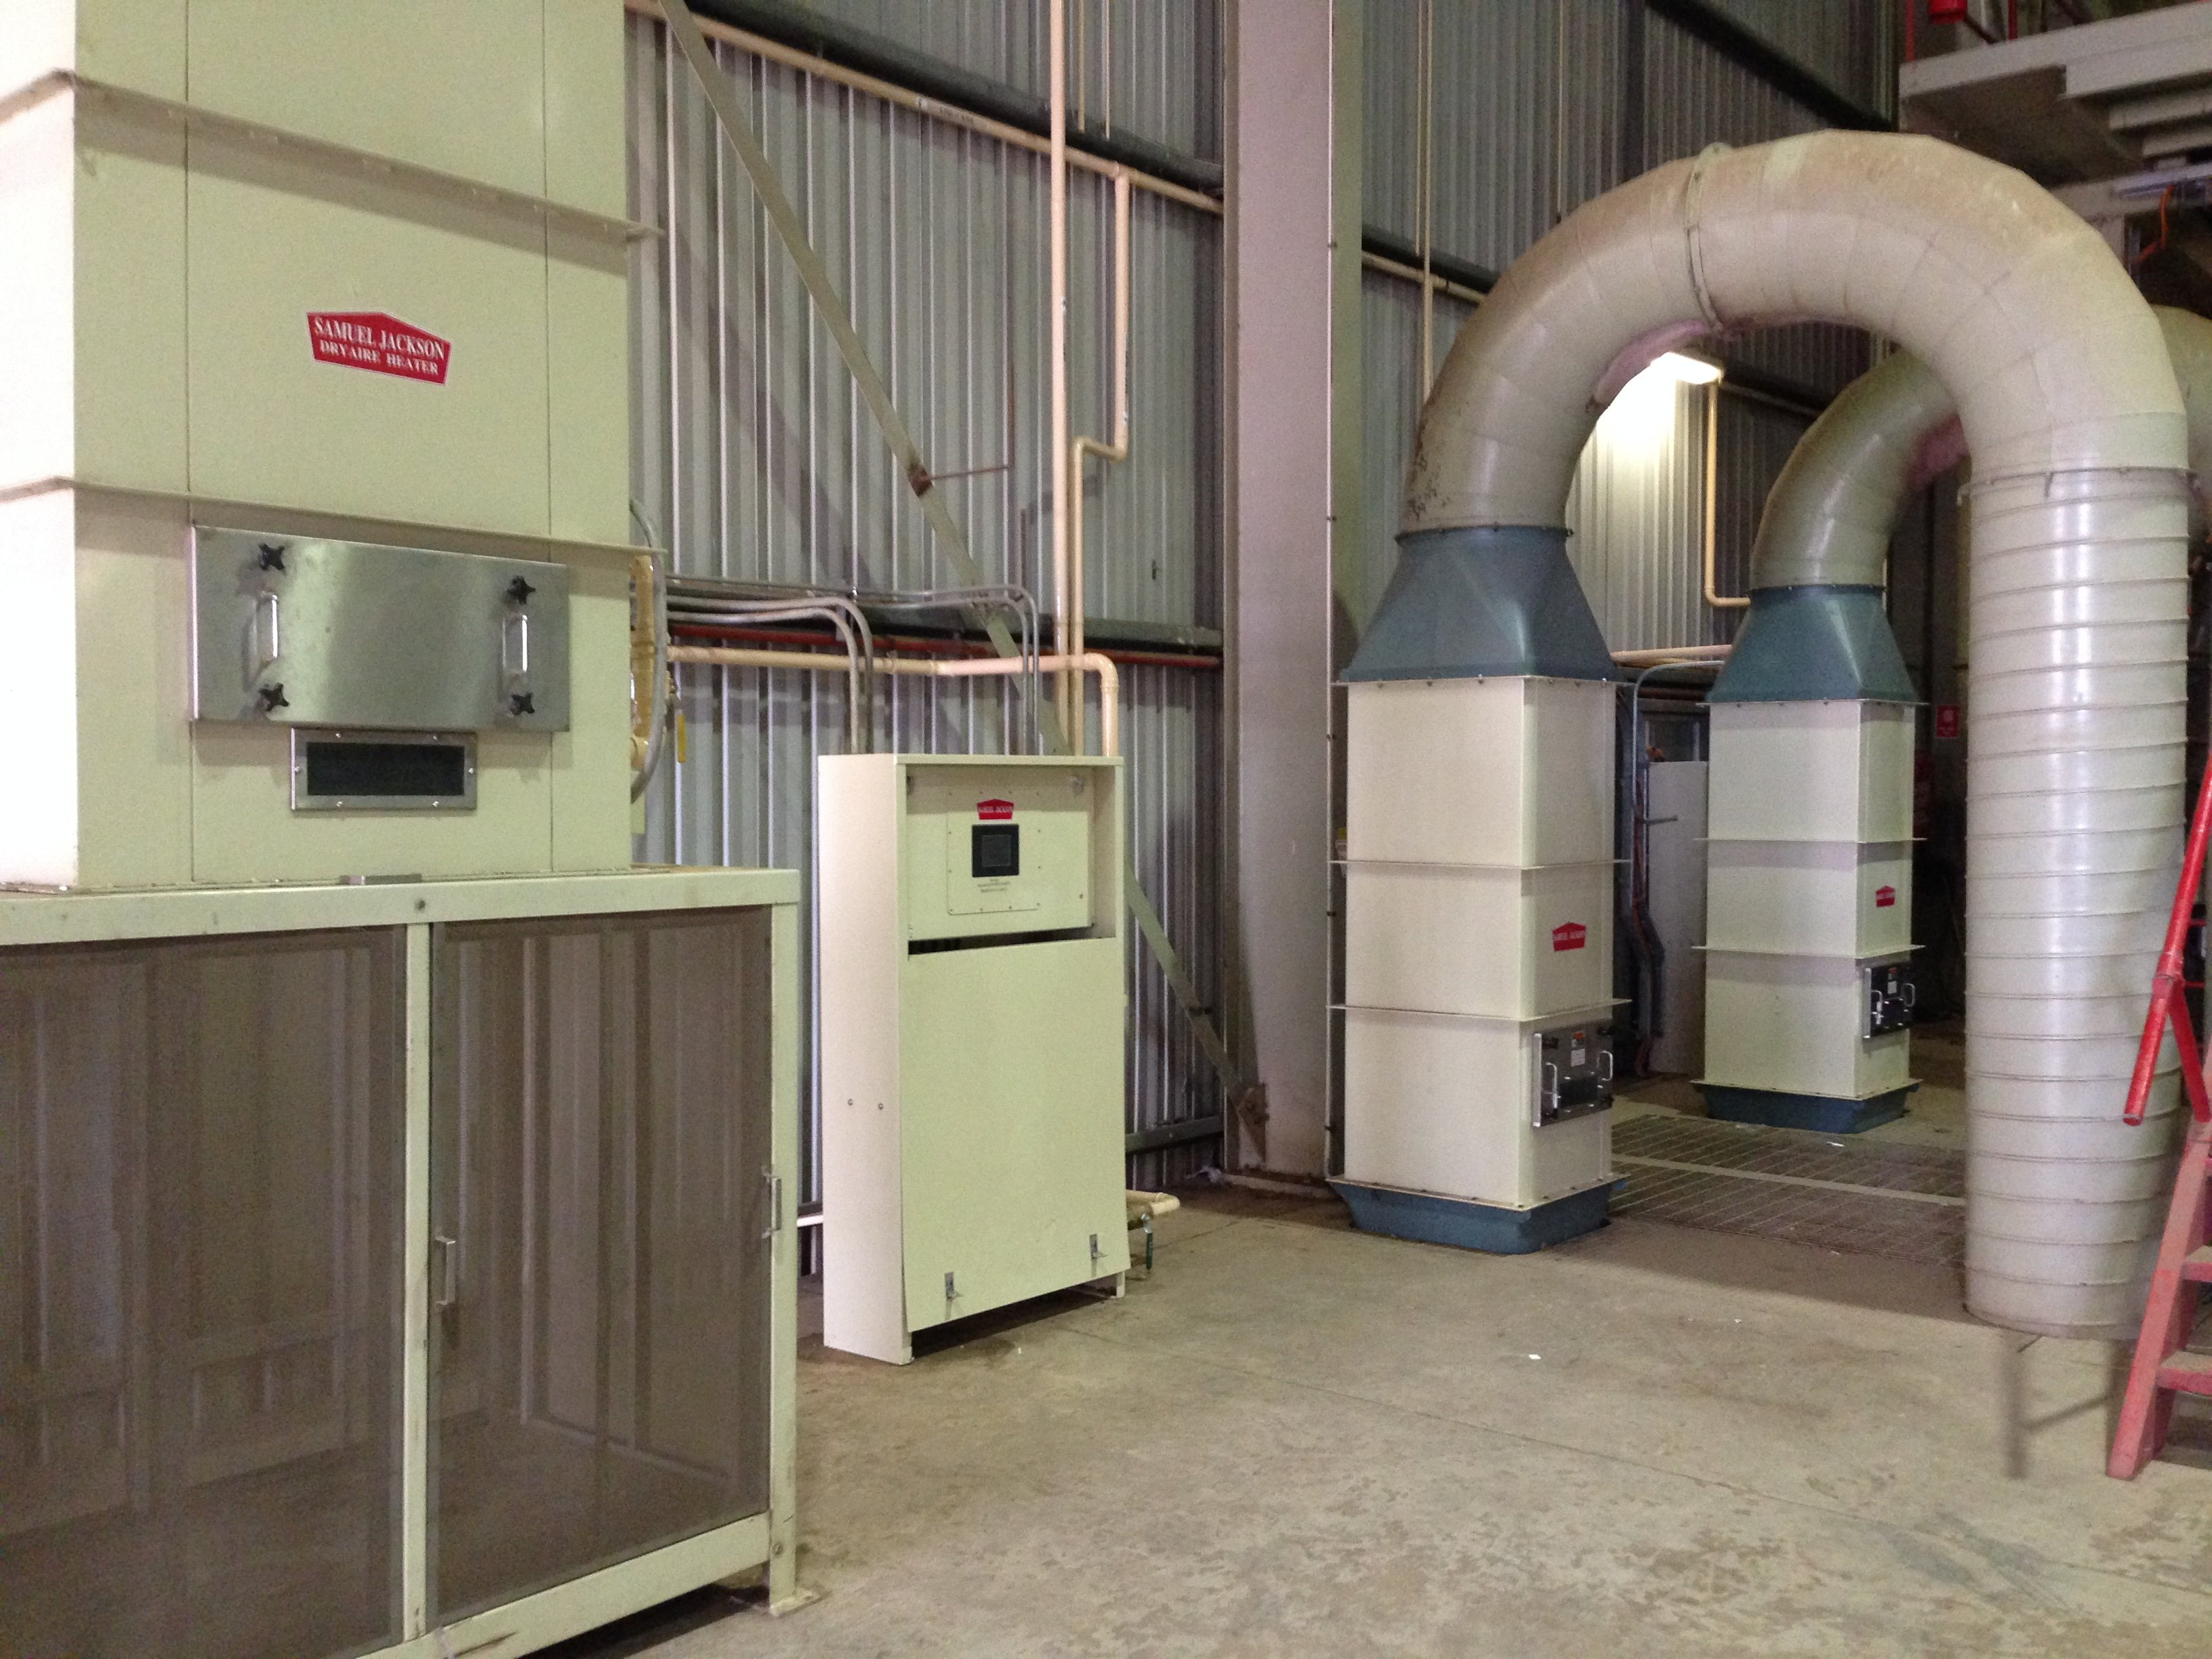 Air heat burners